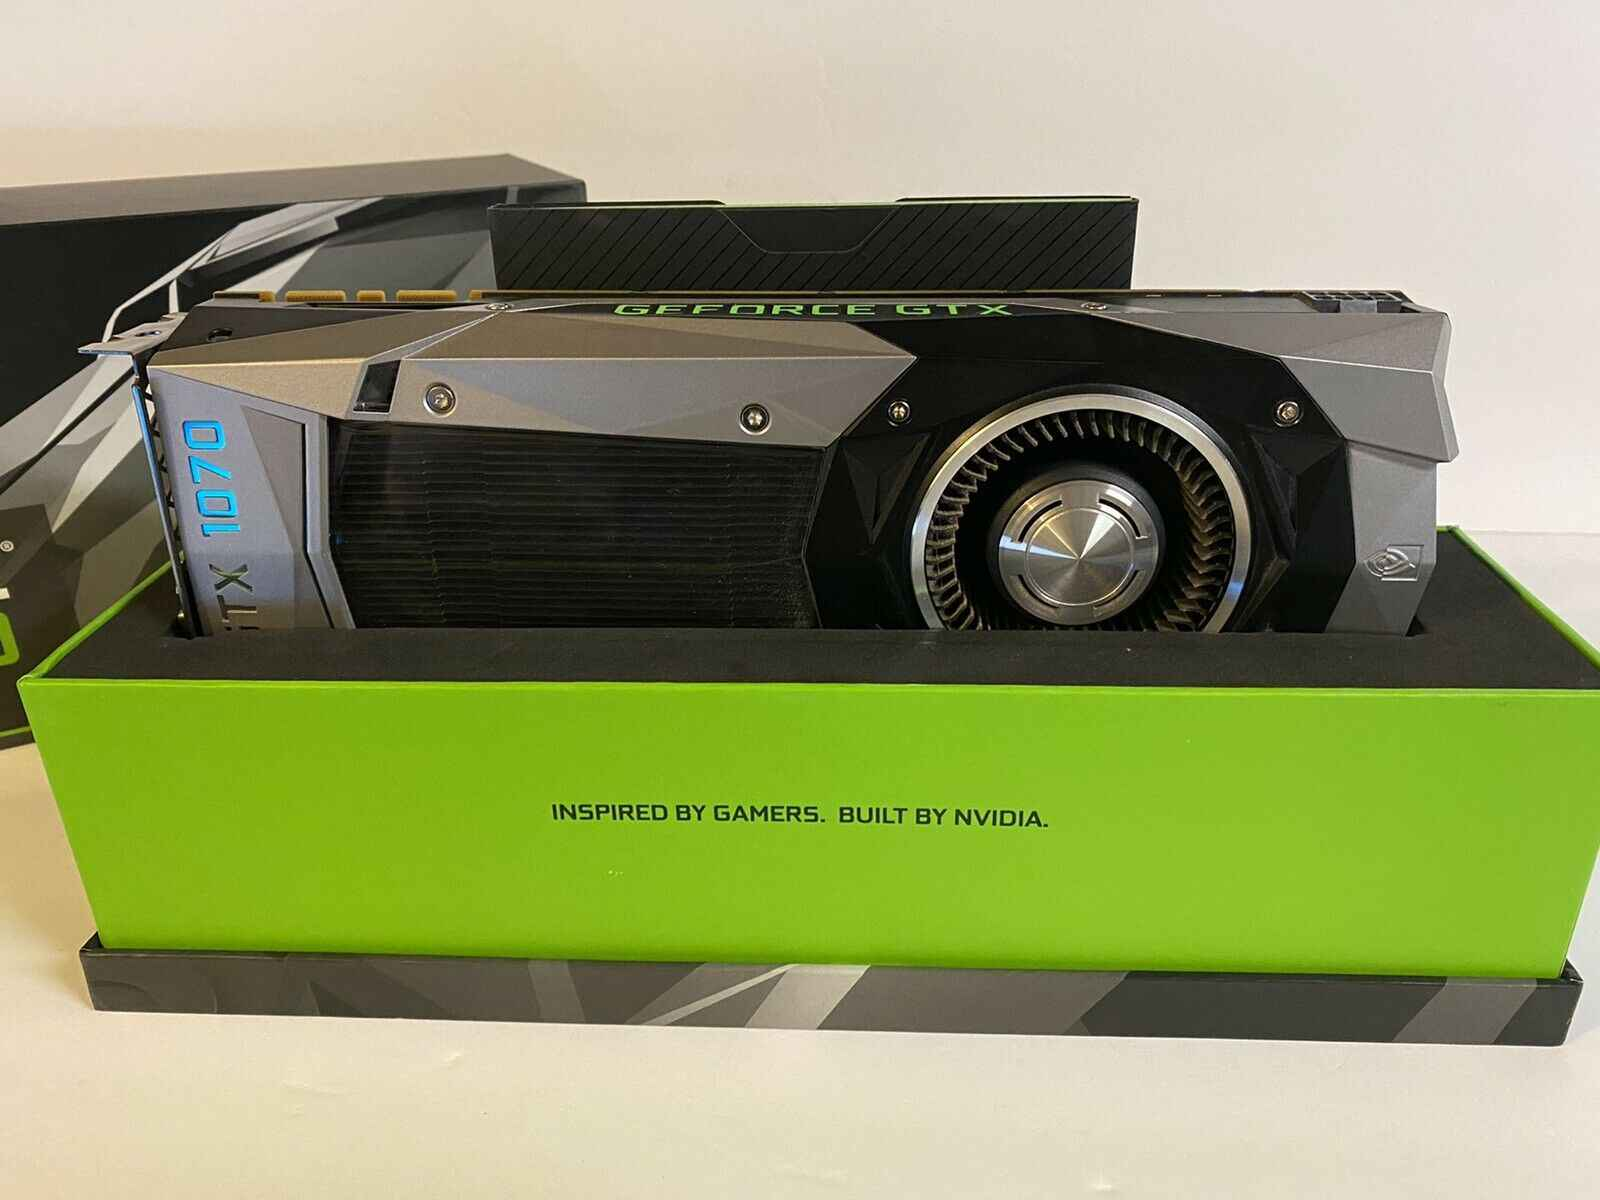 NVIDIA GeForce GTX 1070 Founders Edition 8GB GDDR5 Graphics Card GPU Bemowo - zdjęcie 5